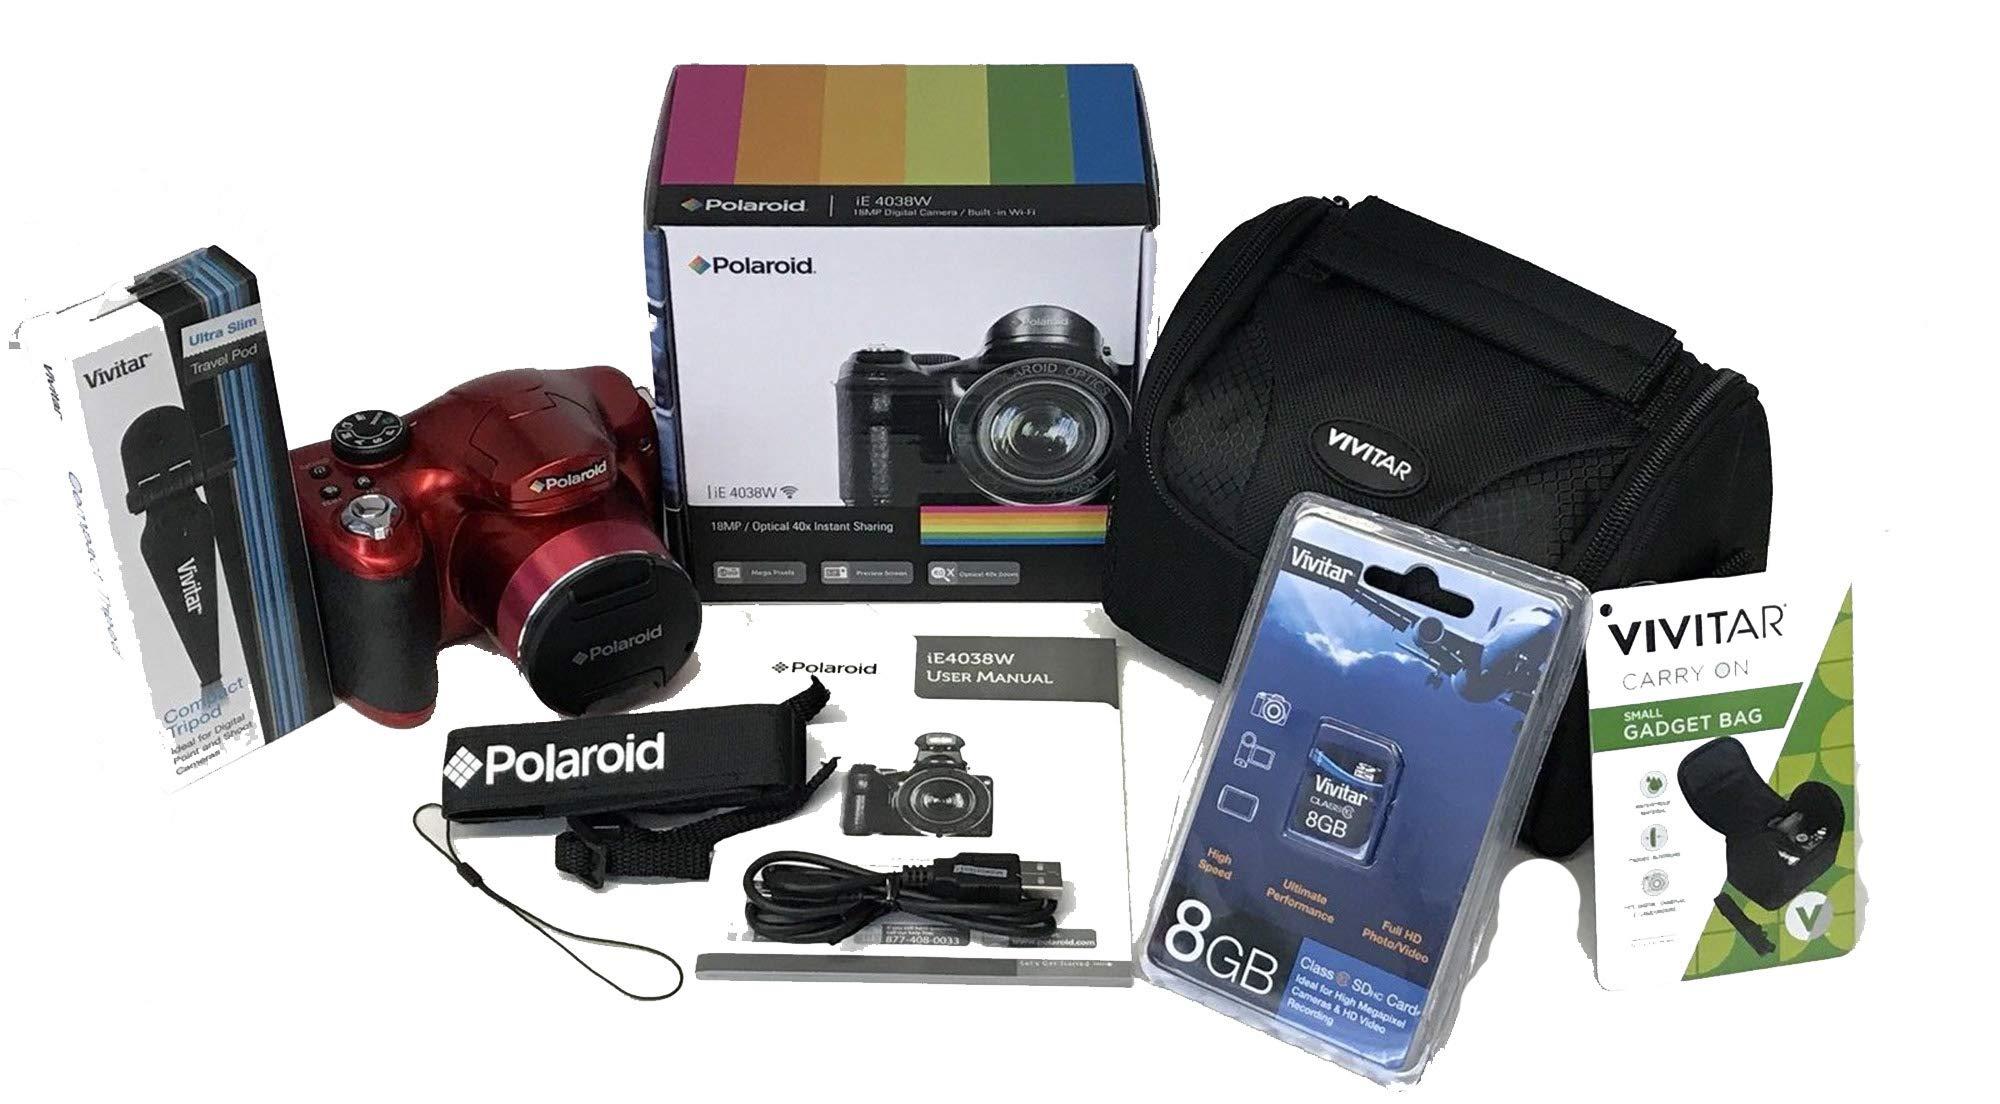 Polaroid iE 4038W 18MP / Optical 40x Instant Sharing Digital Camera,Bundle,Red by Polaroid